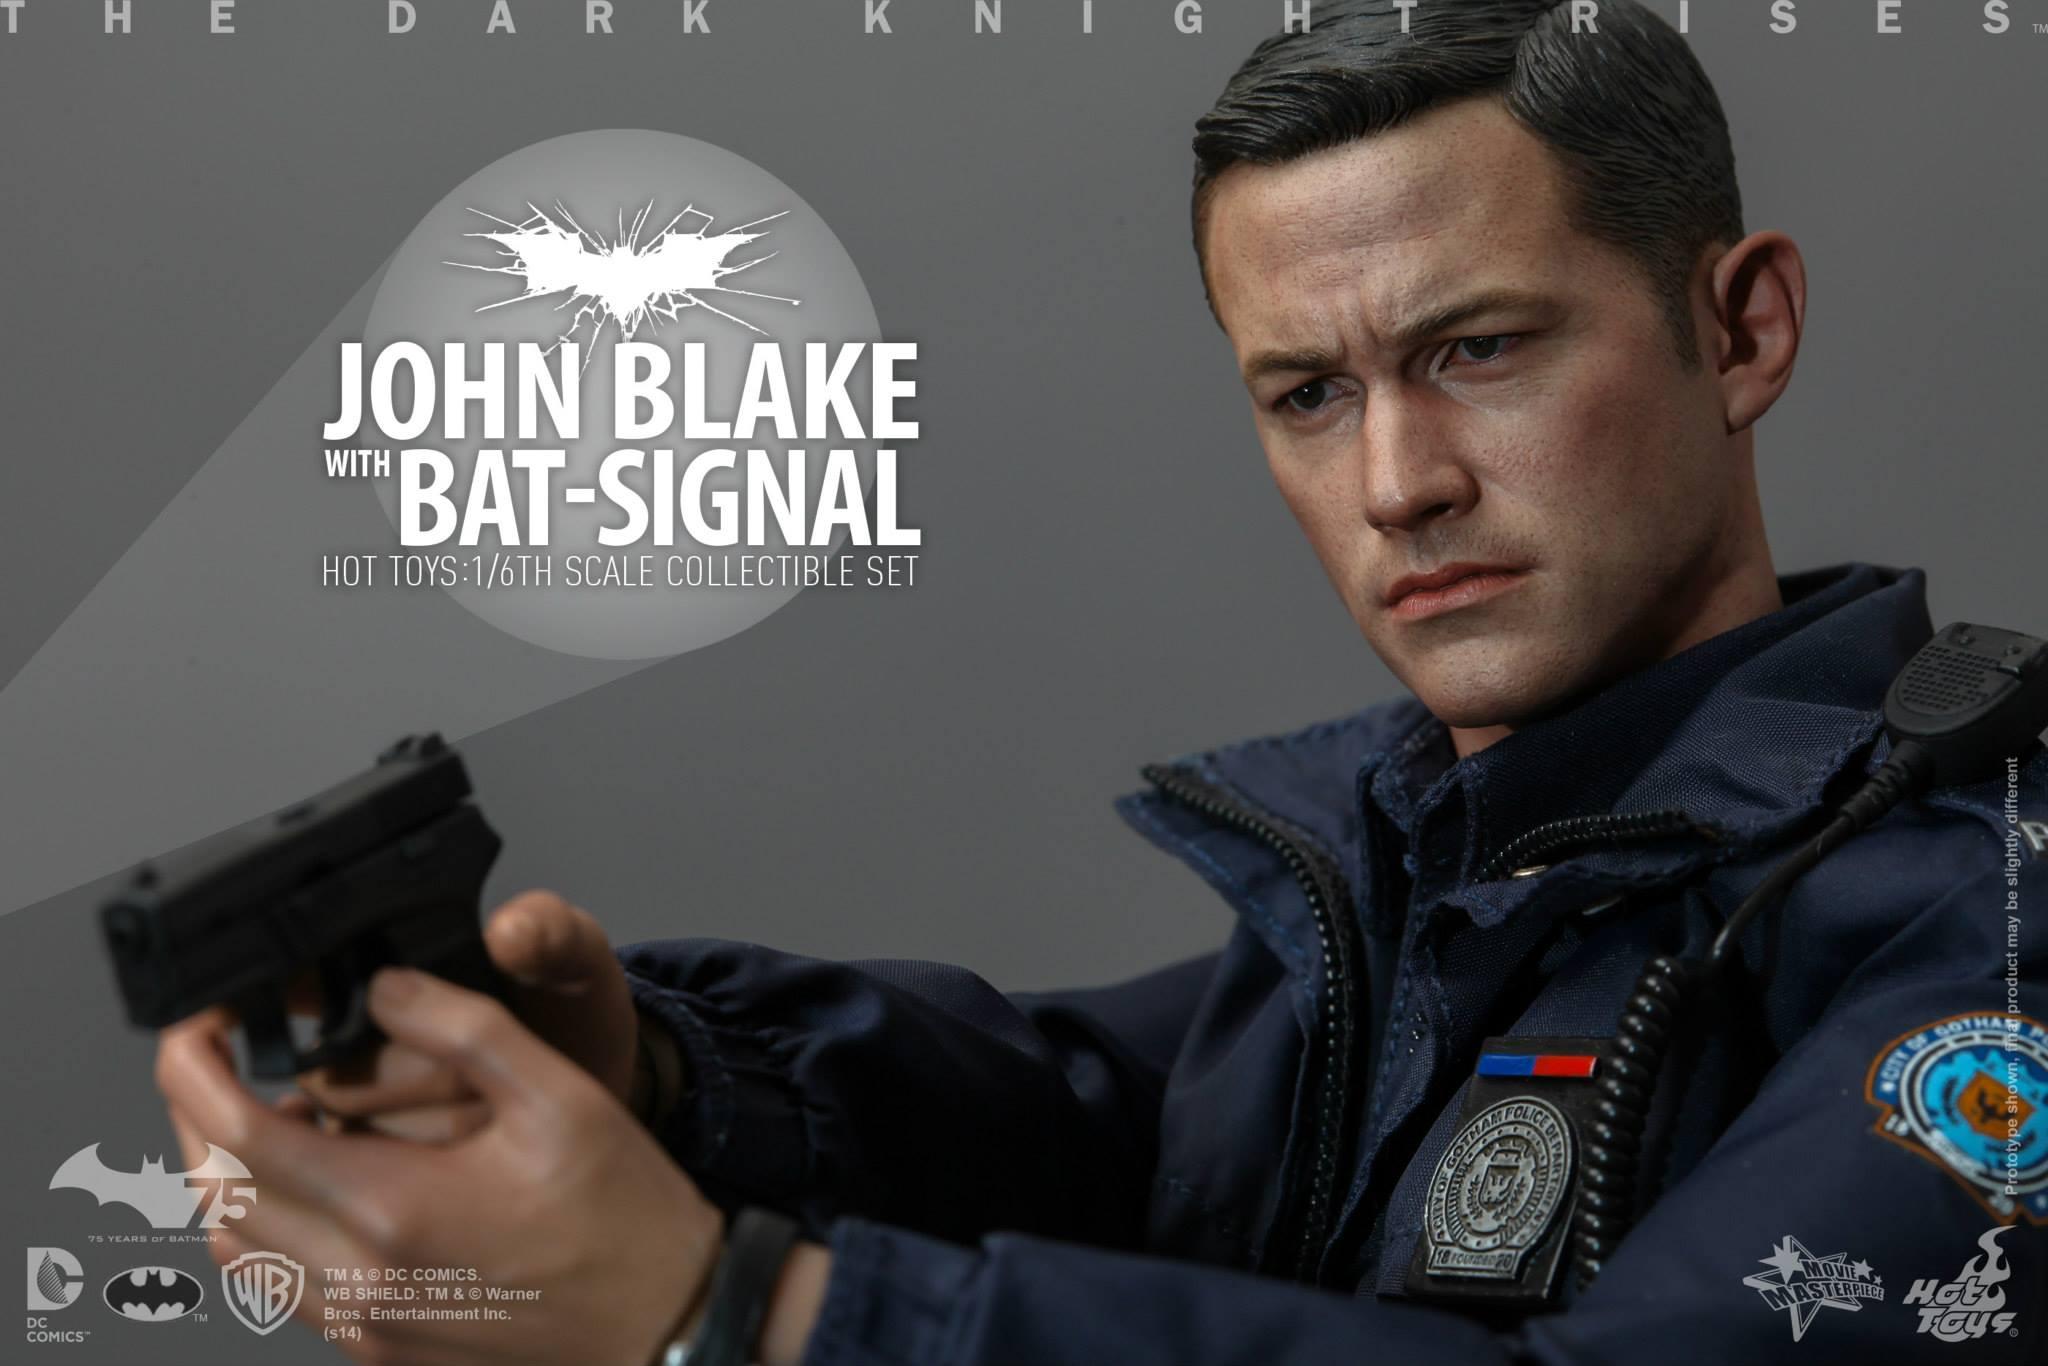 THE DARK KNIGHT RISES - Lt. JIM GORDON & JOHN BLAKE w/BATSIGNAL 846662106